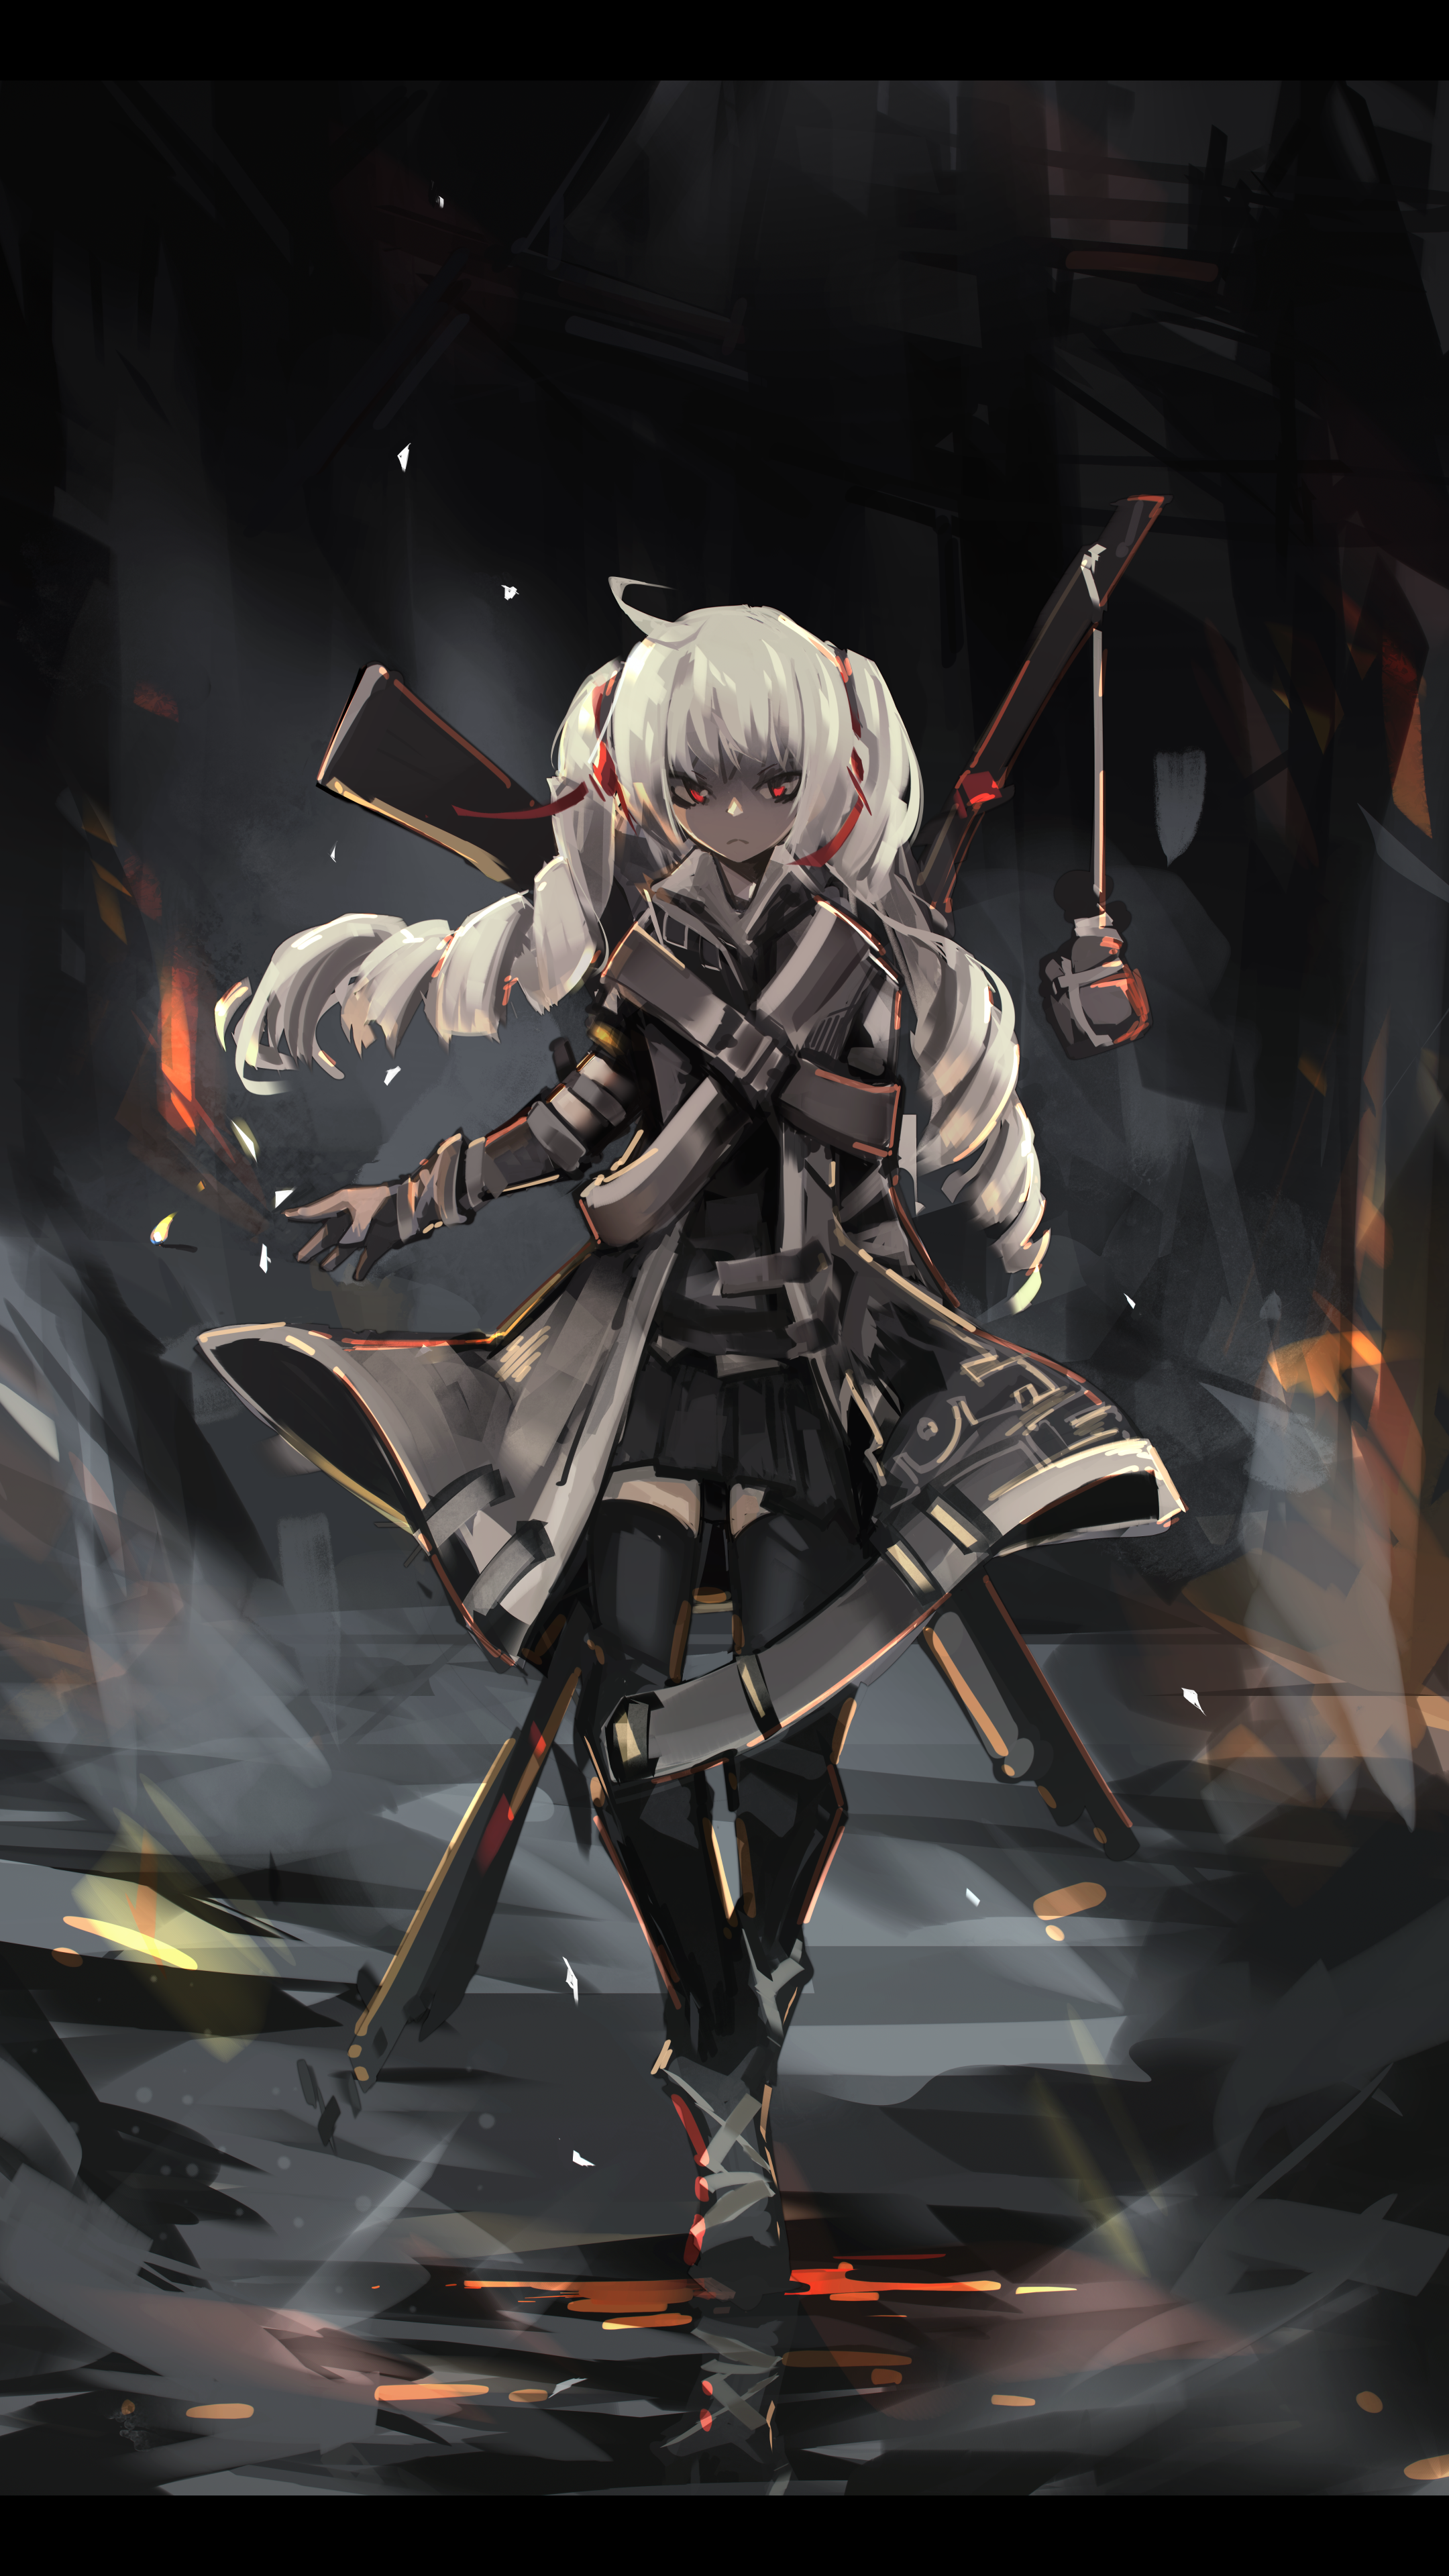 Anime 2160x3840 anime anime girls long hair white hair red eyes weapon